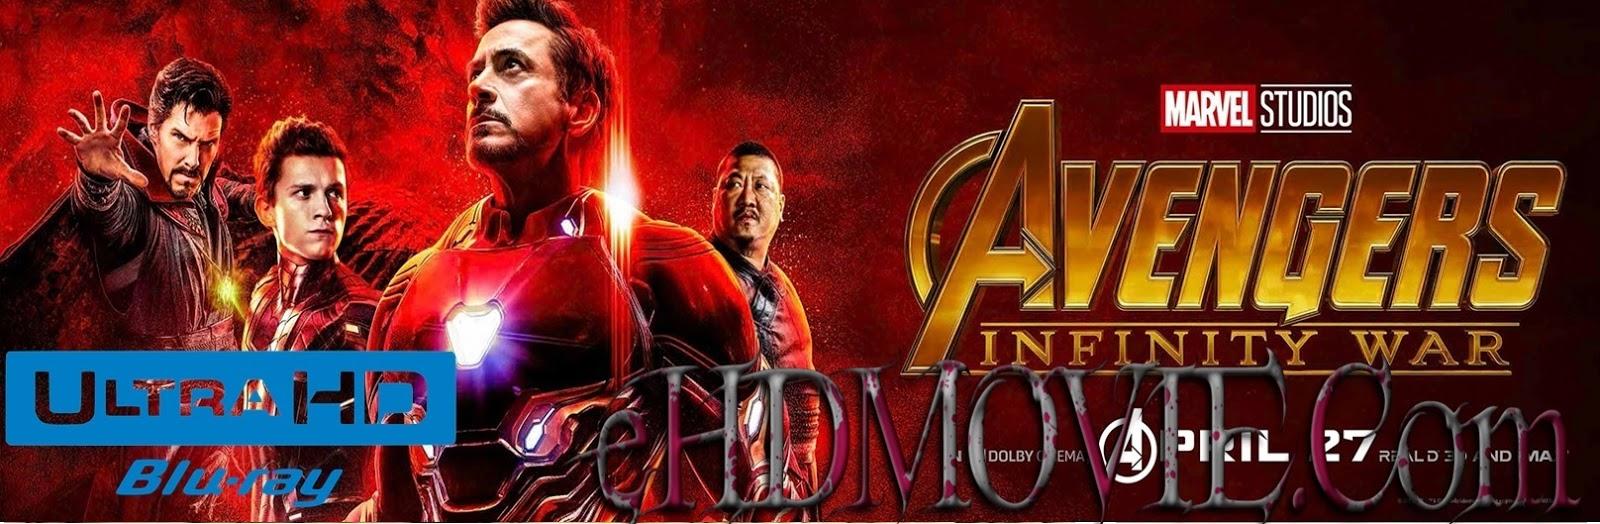 Avengers: Infinity War 2018 Full Movie Dual Audio [Hindi – English] 2160p - 1080p - 720p - HEVC - 480p ORG BRRip 250MB - 400MB - 1.1GB - 4.2GB - 5.6GB ESubs Free Download